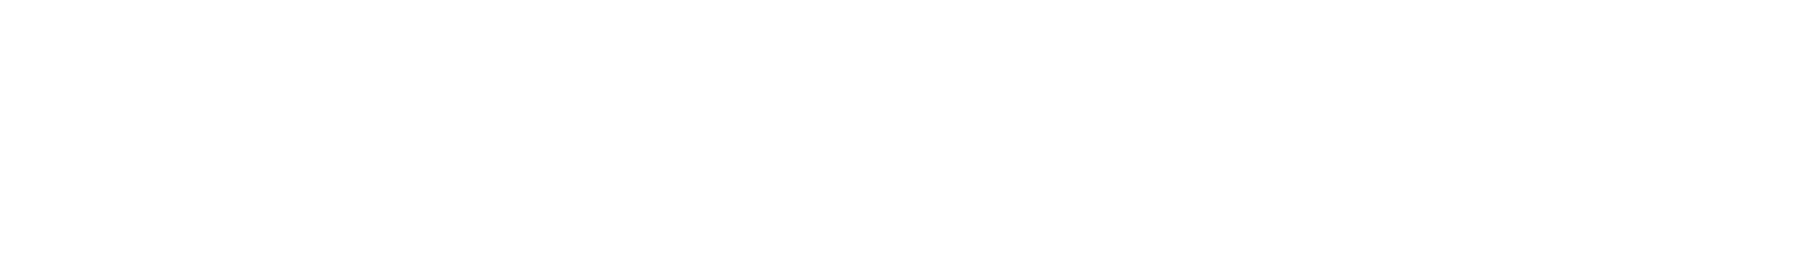 dts chordlp 19a cm